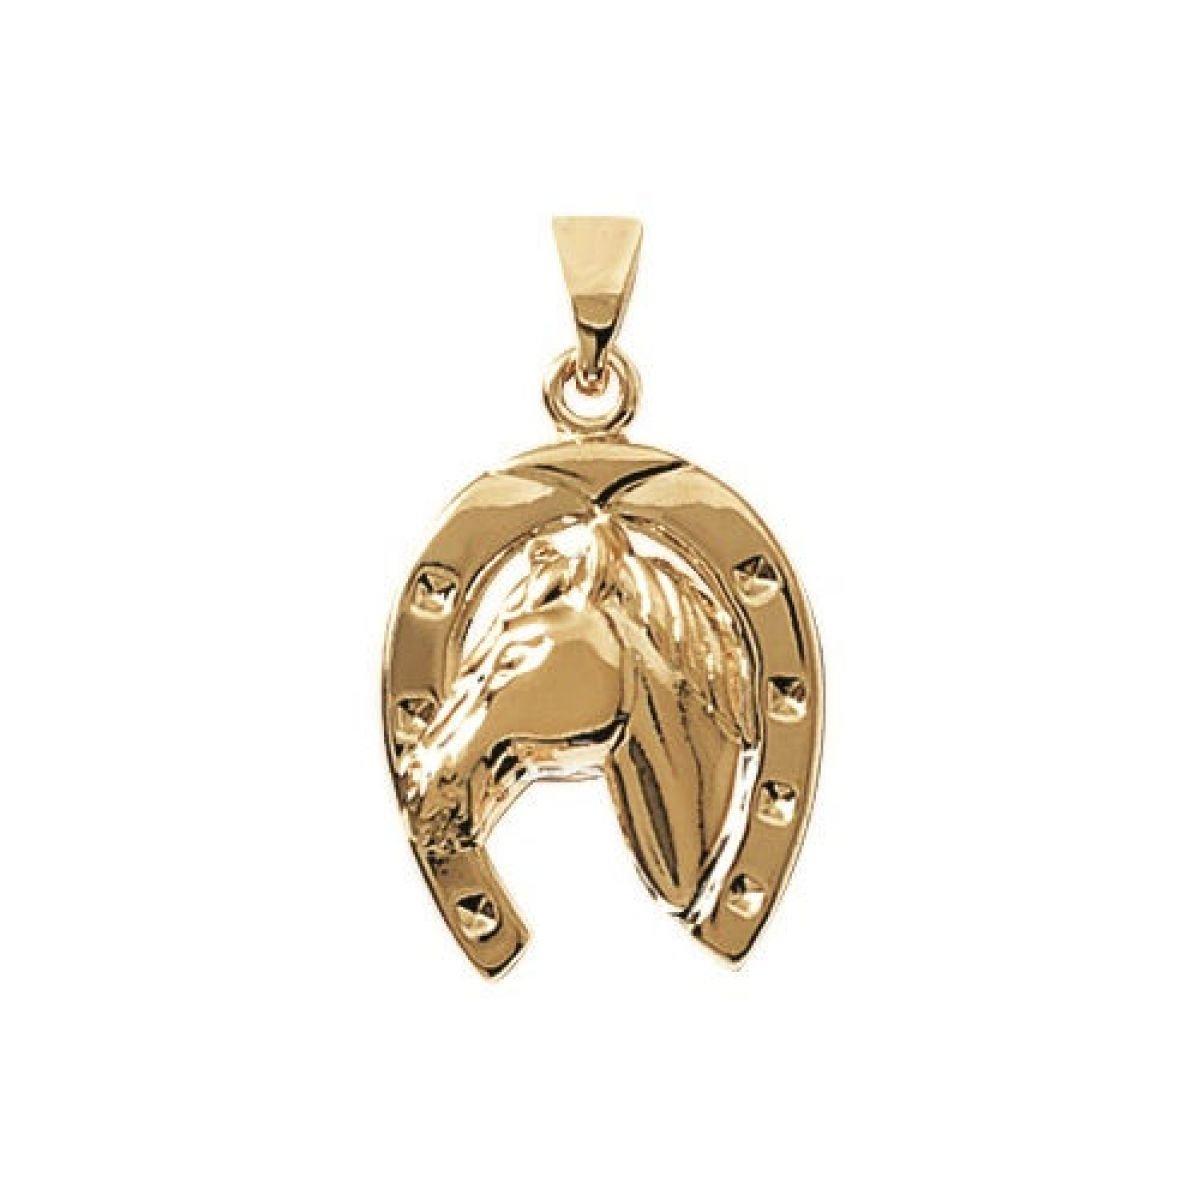 MARY JANE - Pendentif plaqué Or Femme/Homme - Larg:16mm / Haut:20mm - Plaqué or (Chance/Cheval / Fer à cheval)